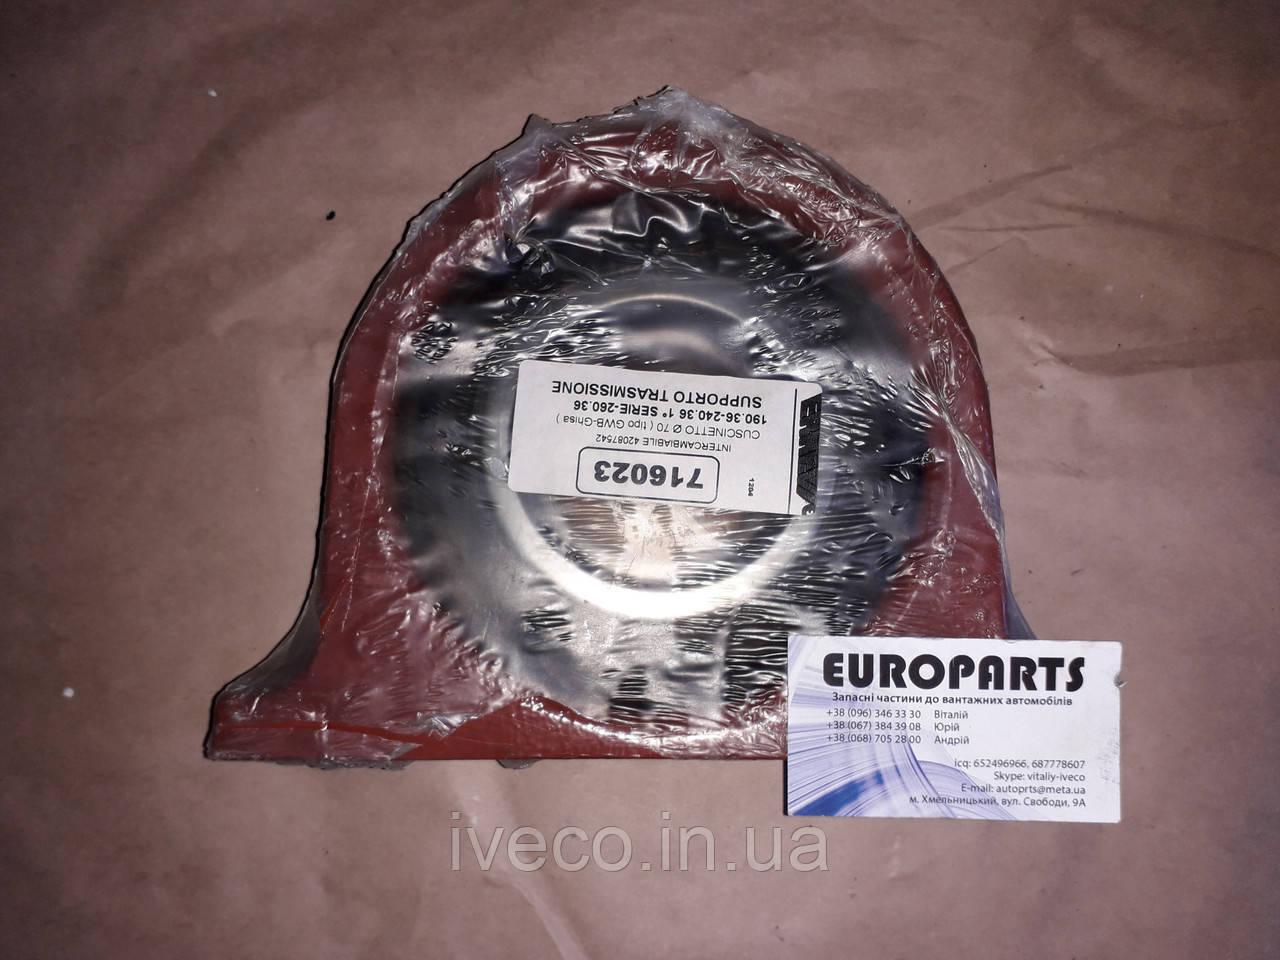 Подвесной подшипник 70mm EUROSTAR IVECO EUROTECH EUROTRAKKER STRALIS 93190884 42560645